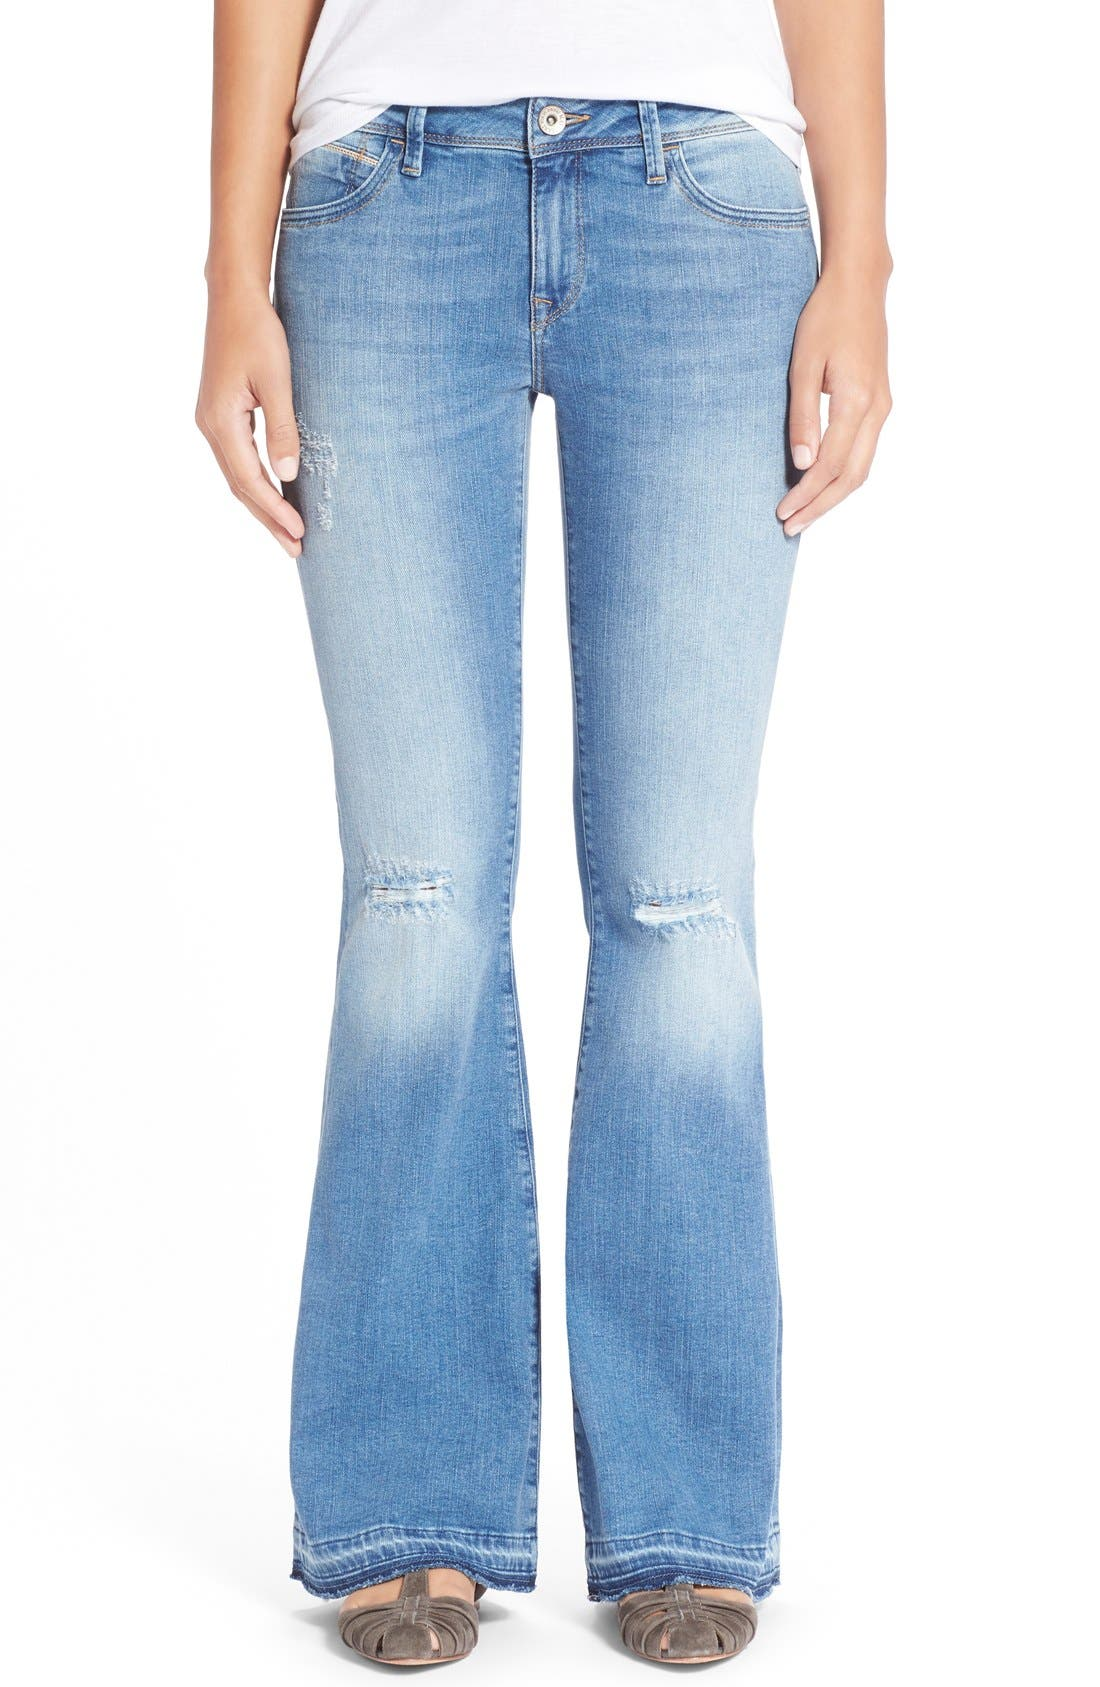 Alternate Image 1 Selected - Mavi Jeans 'Peace' Stretch Flare Leg Jeans (Light Ripped)